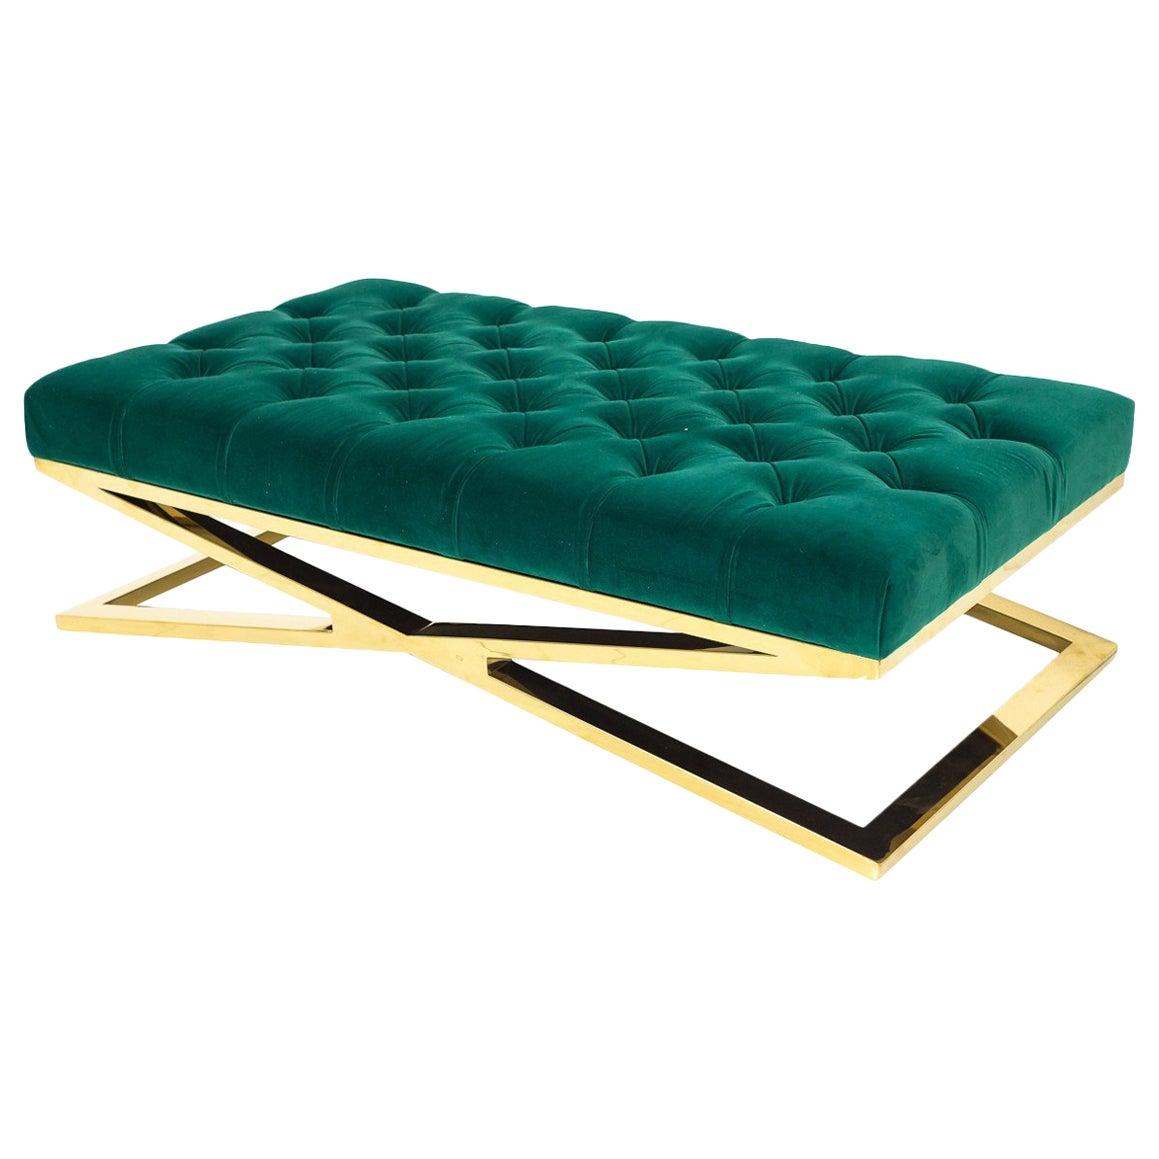 Modern Style Velvet Tufted Ottoman Bench with Polished Brass X-Base Frames